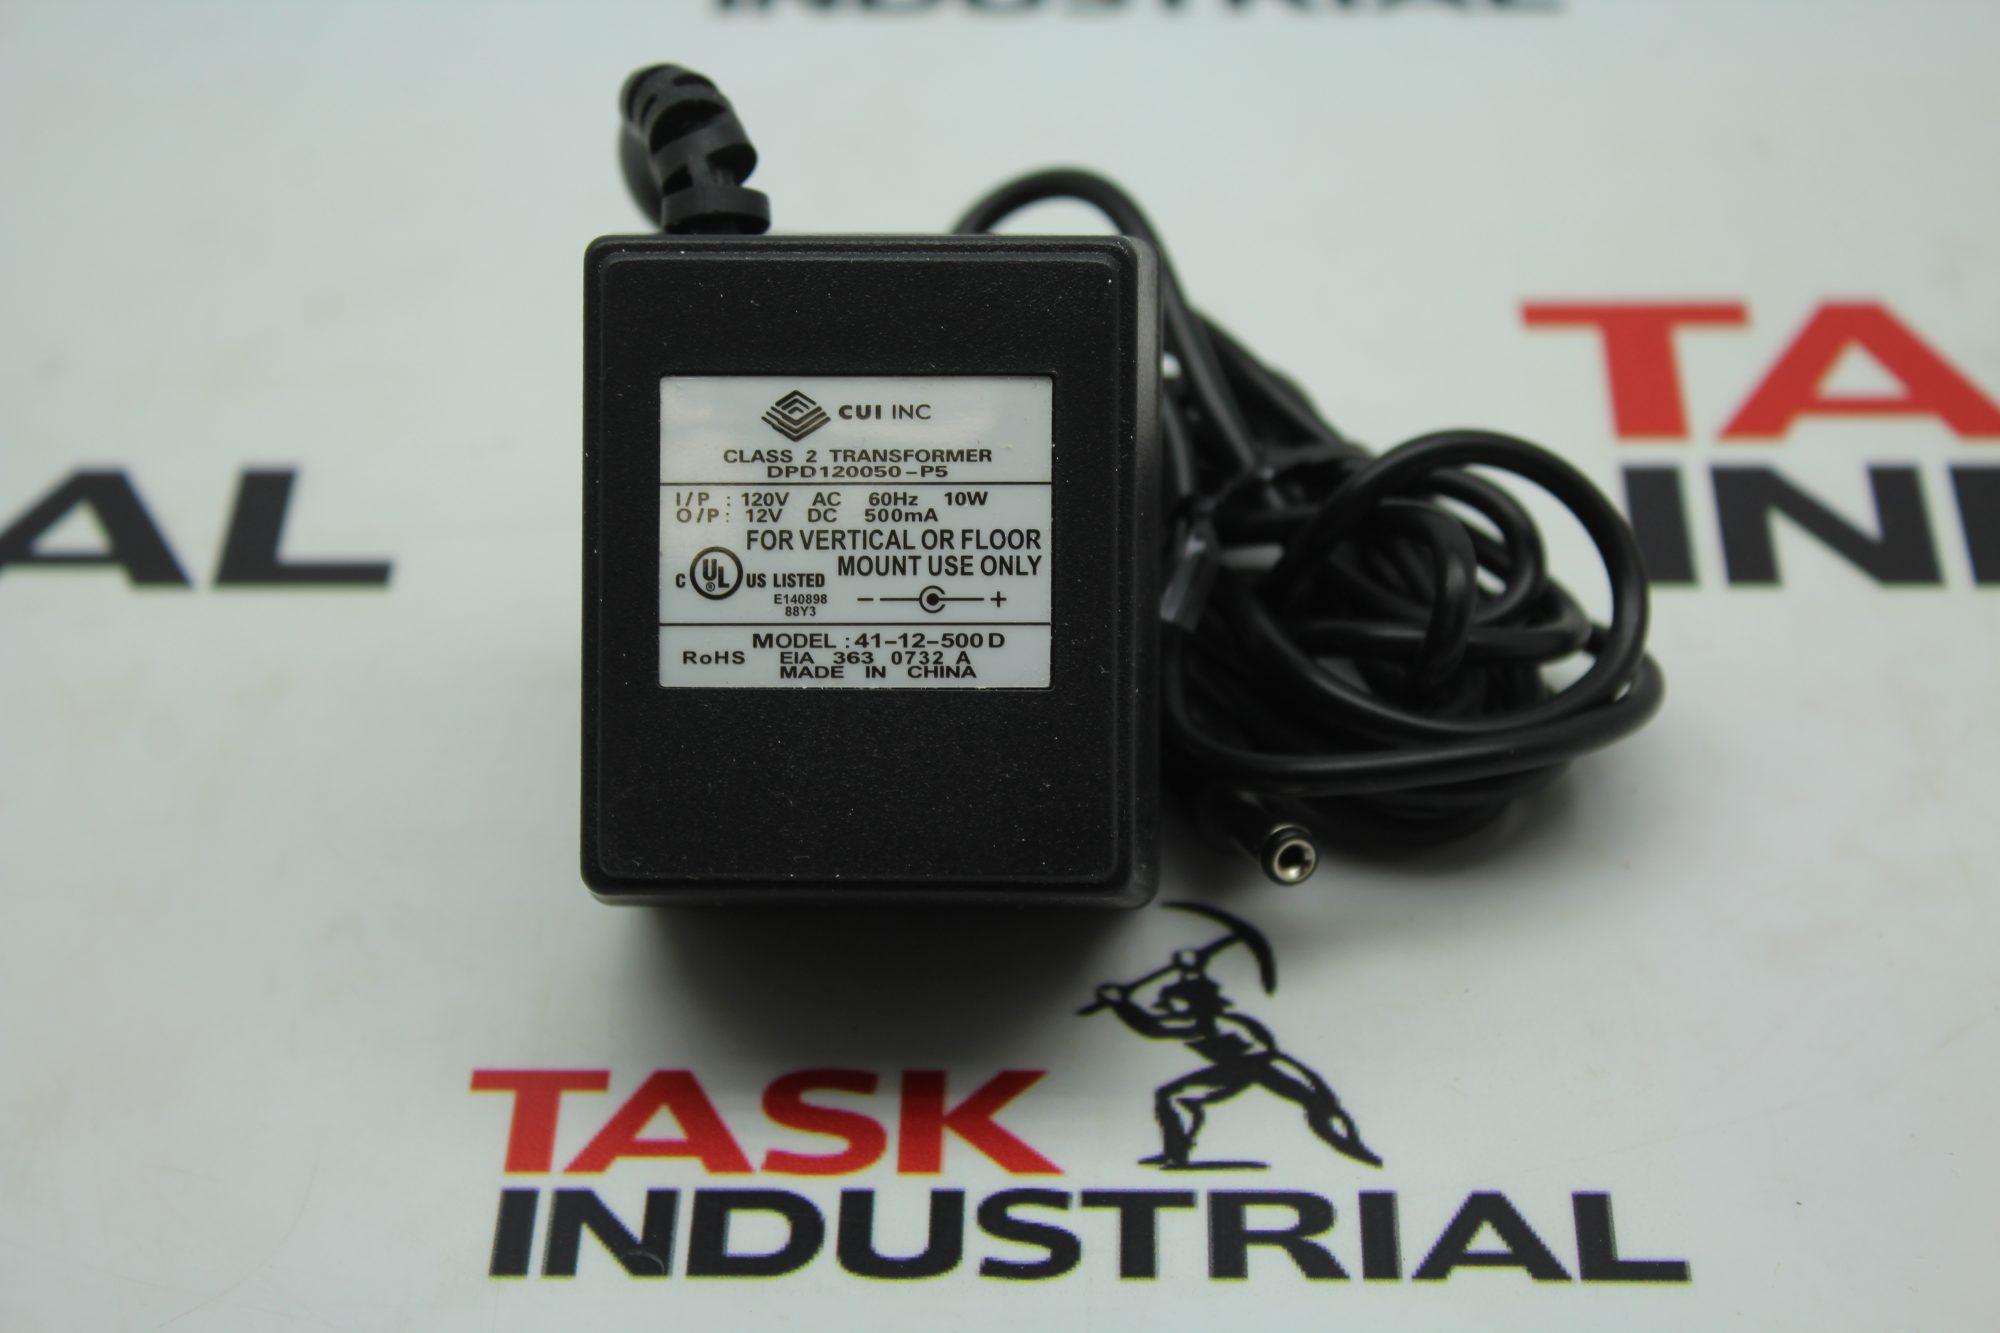 CUI Inc Class 2 Transformer DPD120050-P5